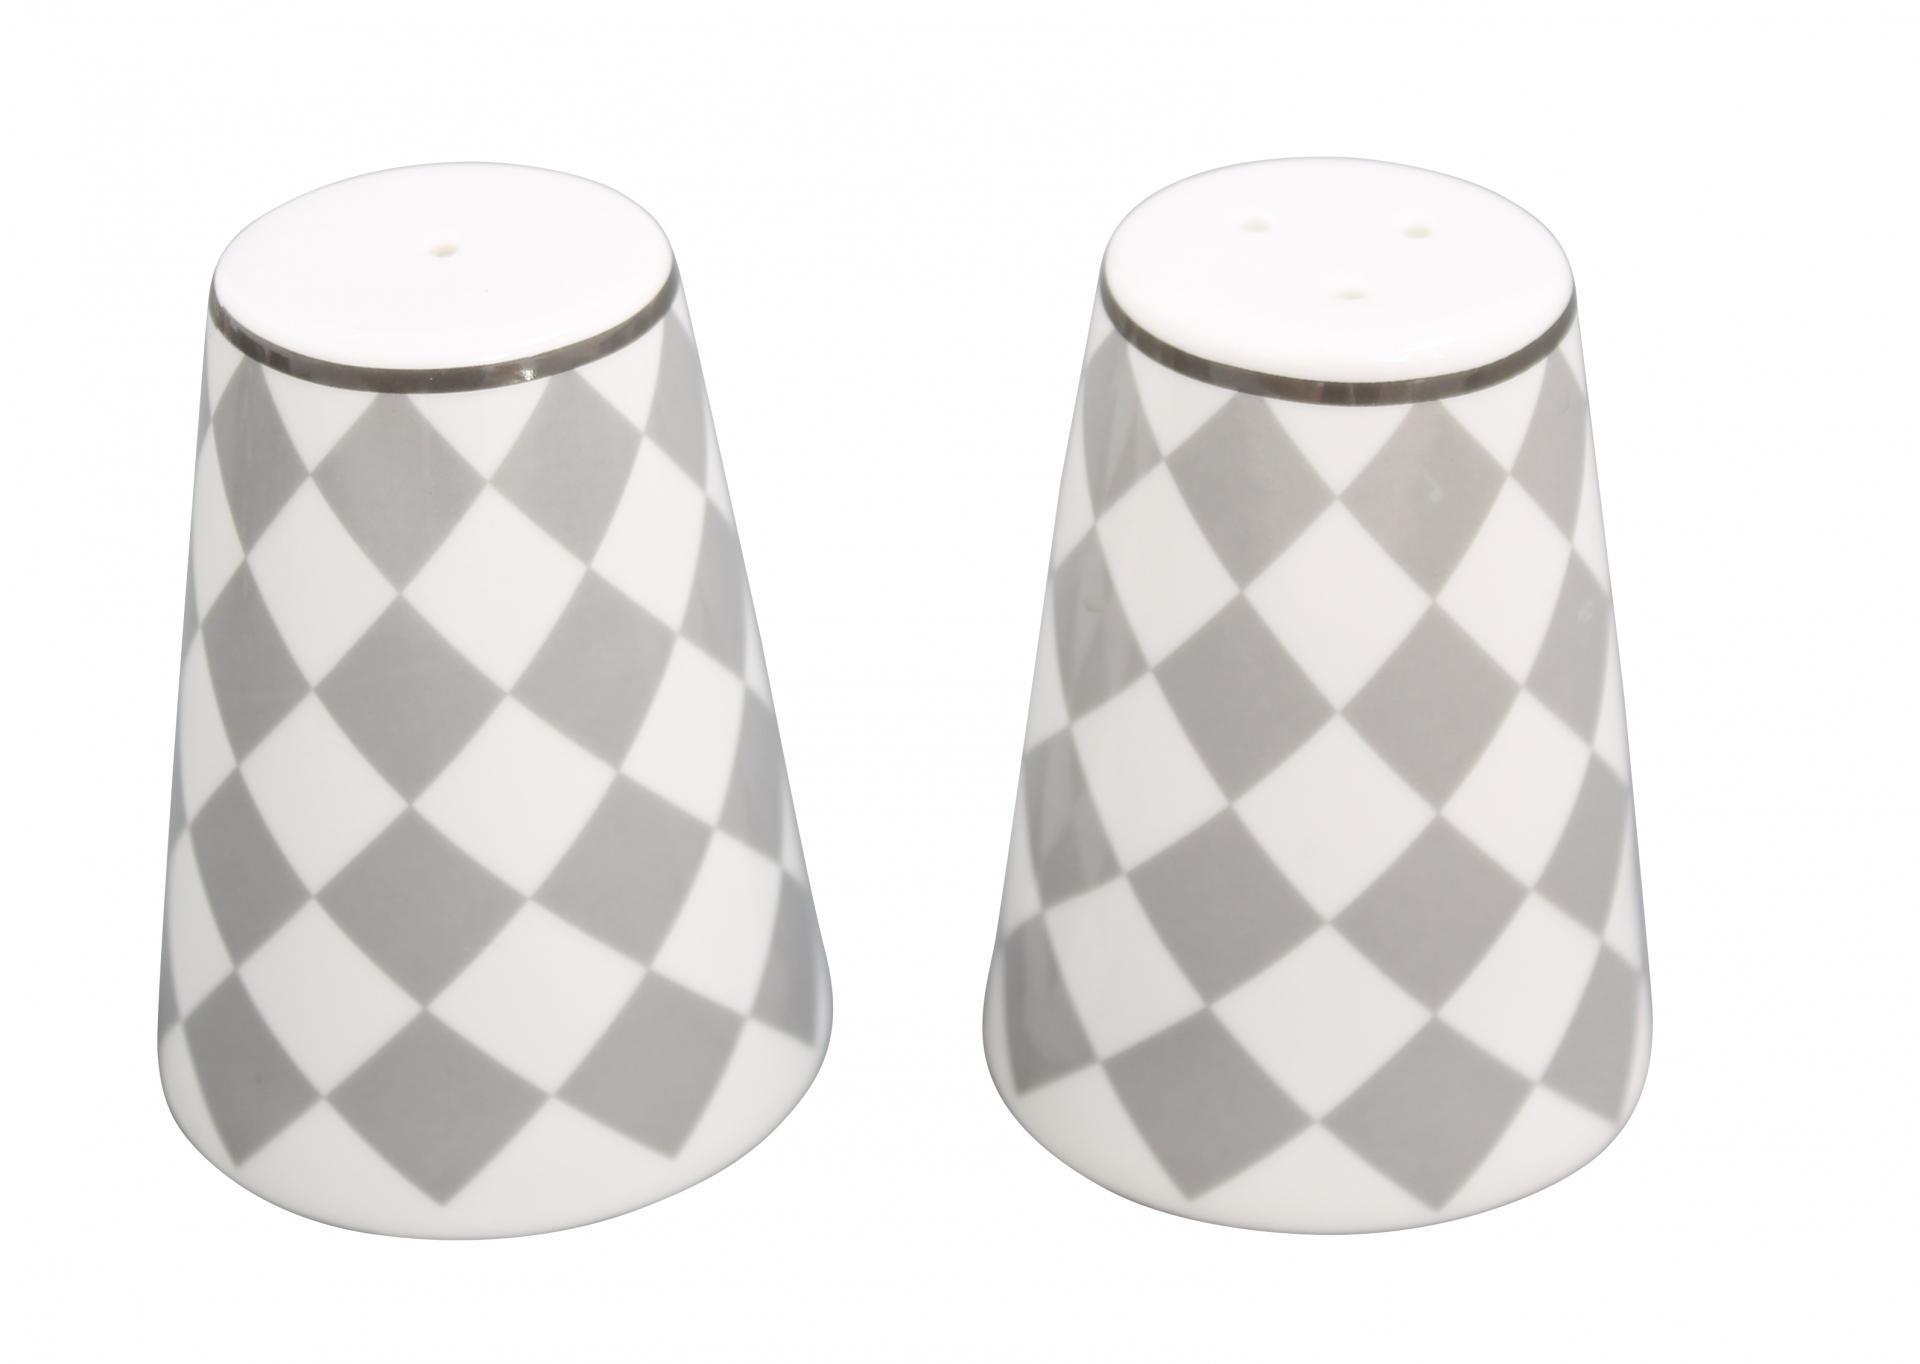 Krasilnikoff Solnička a pepřenka Light grey harlekin, šedá barva, porcelán